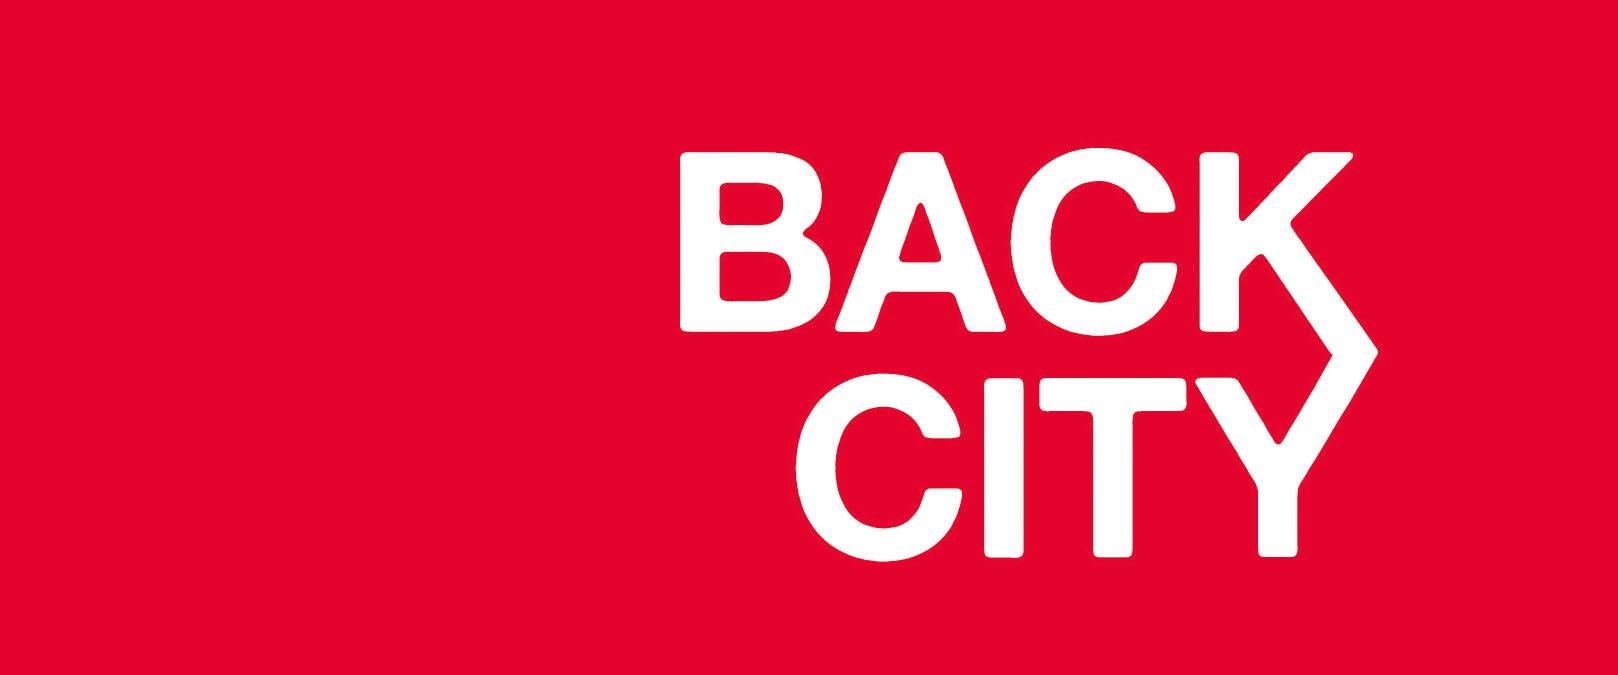 BackCity logotyp